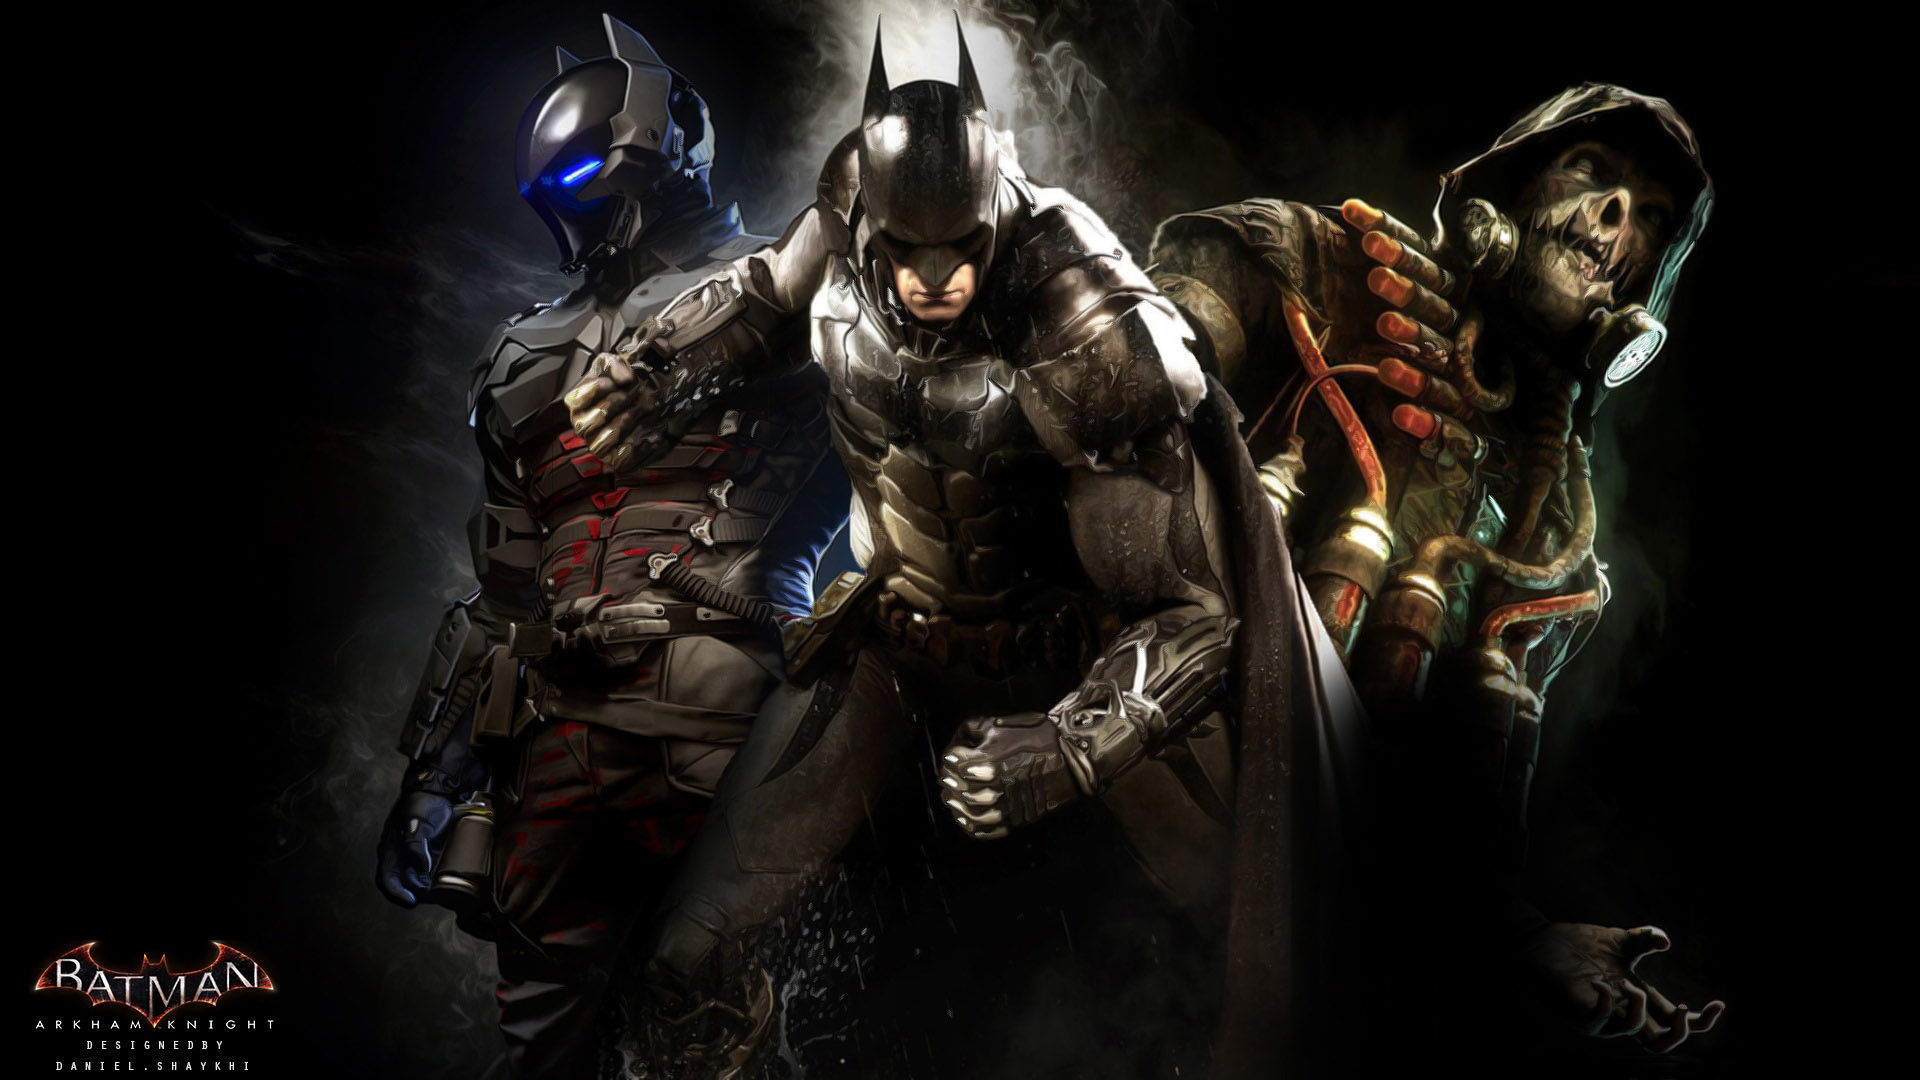 batman-arkham-knight-wallpaper-batman-arkham-knight-scarecrow-isn-t ...